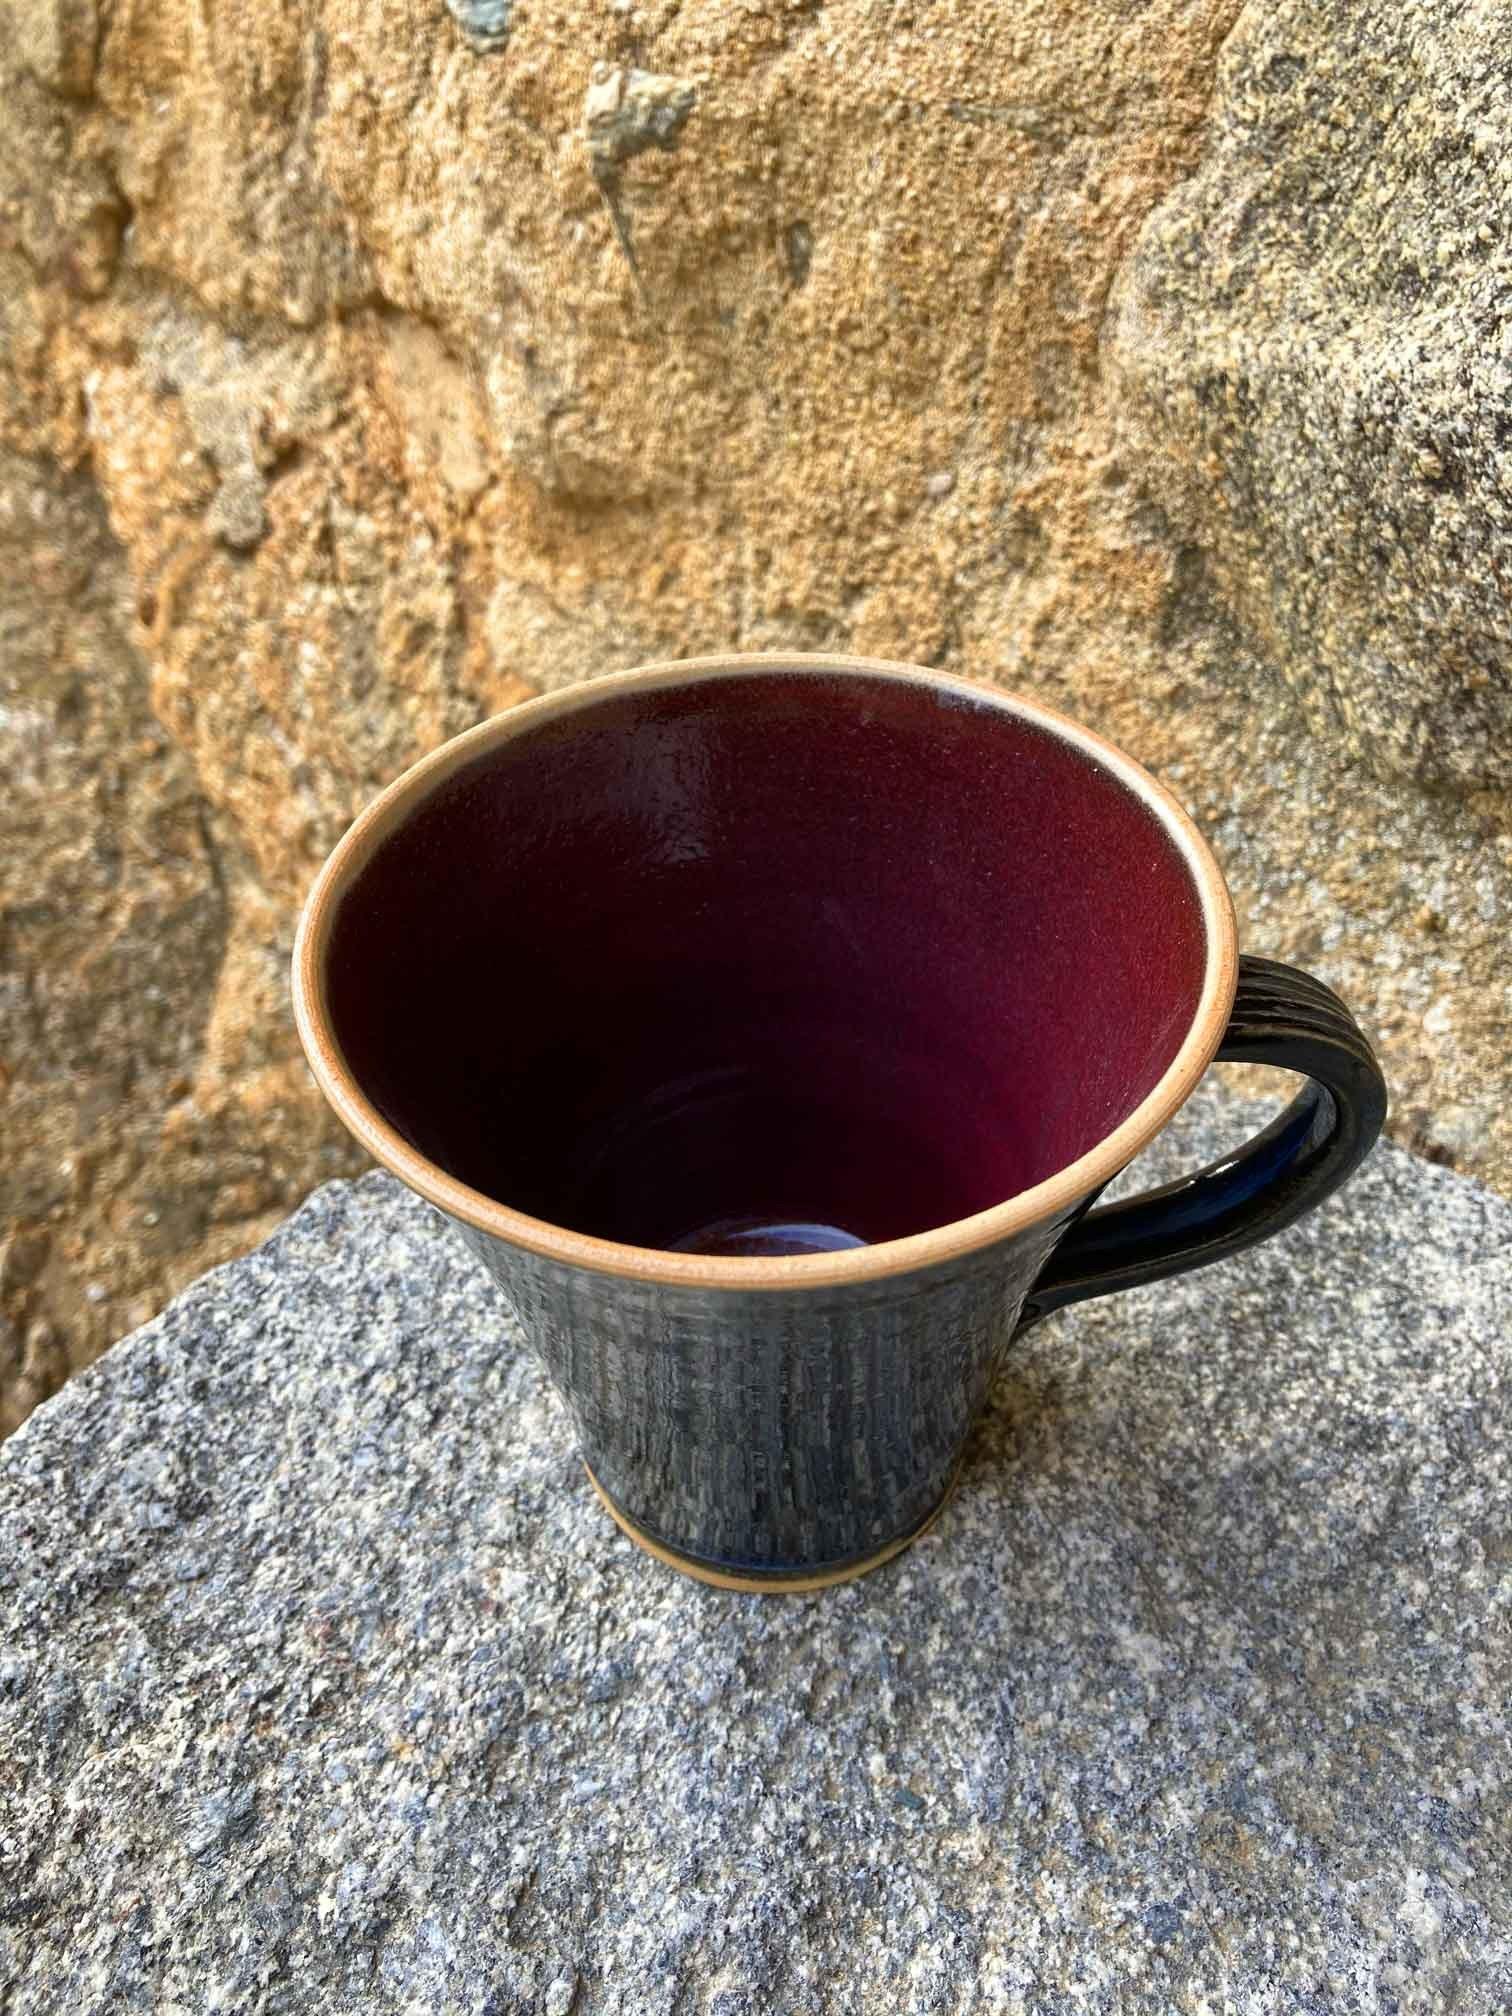 022-Mug-grès-bleu-et-rouge